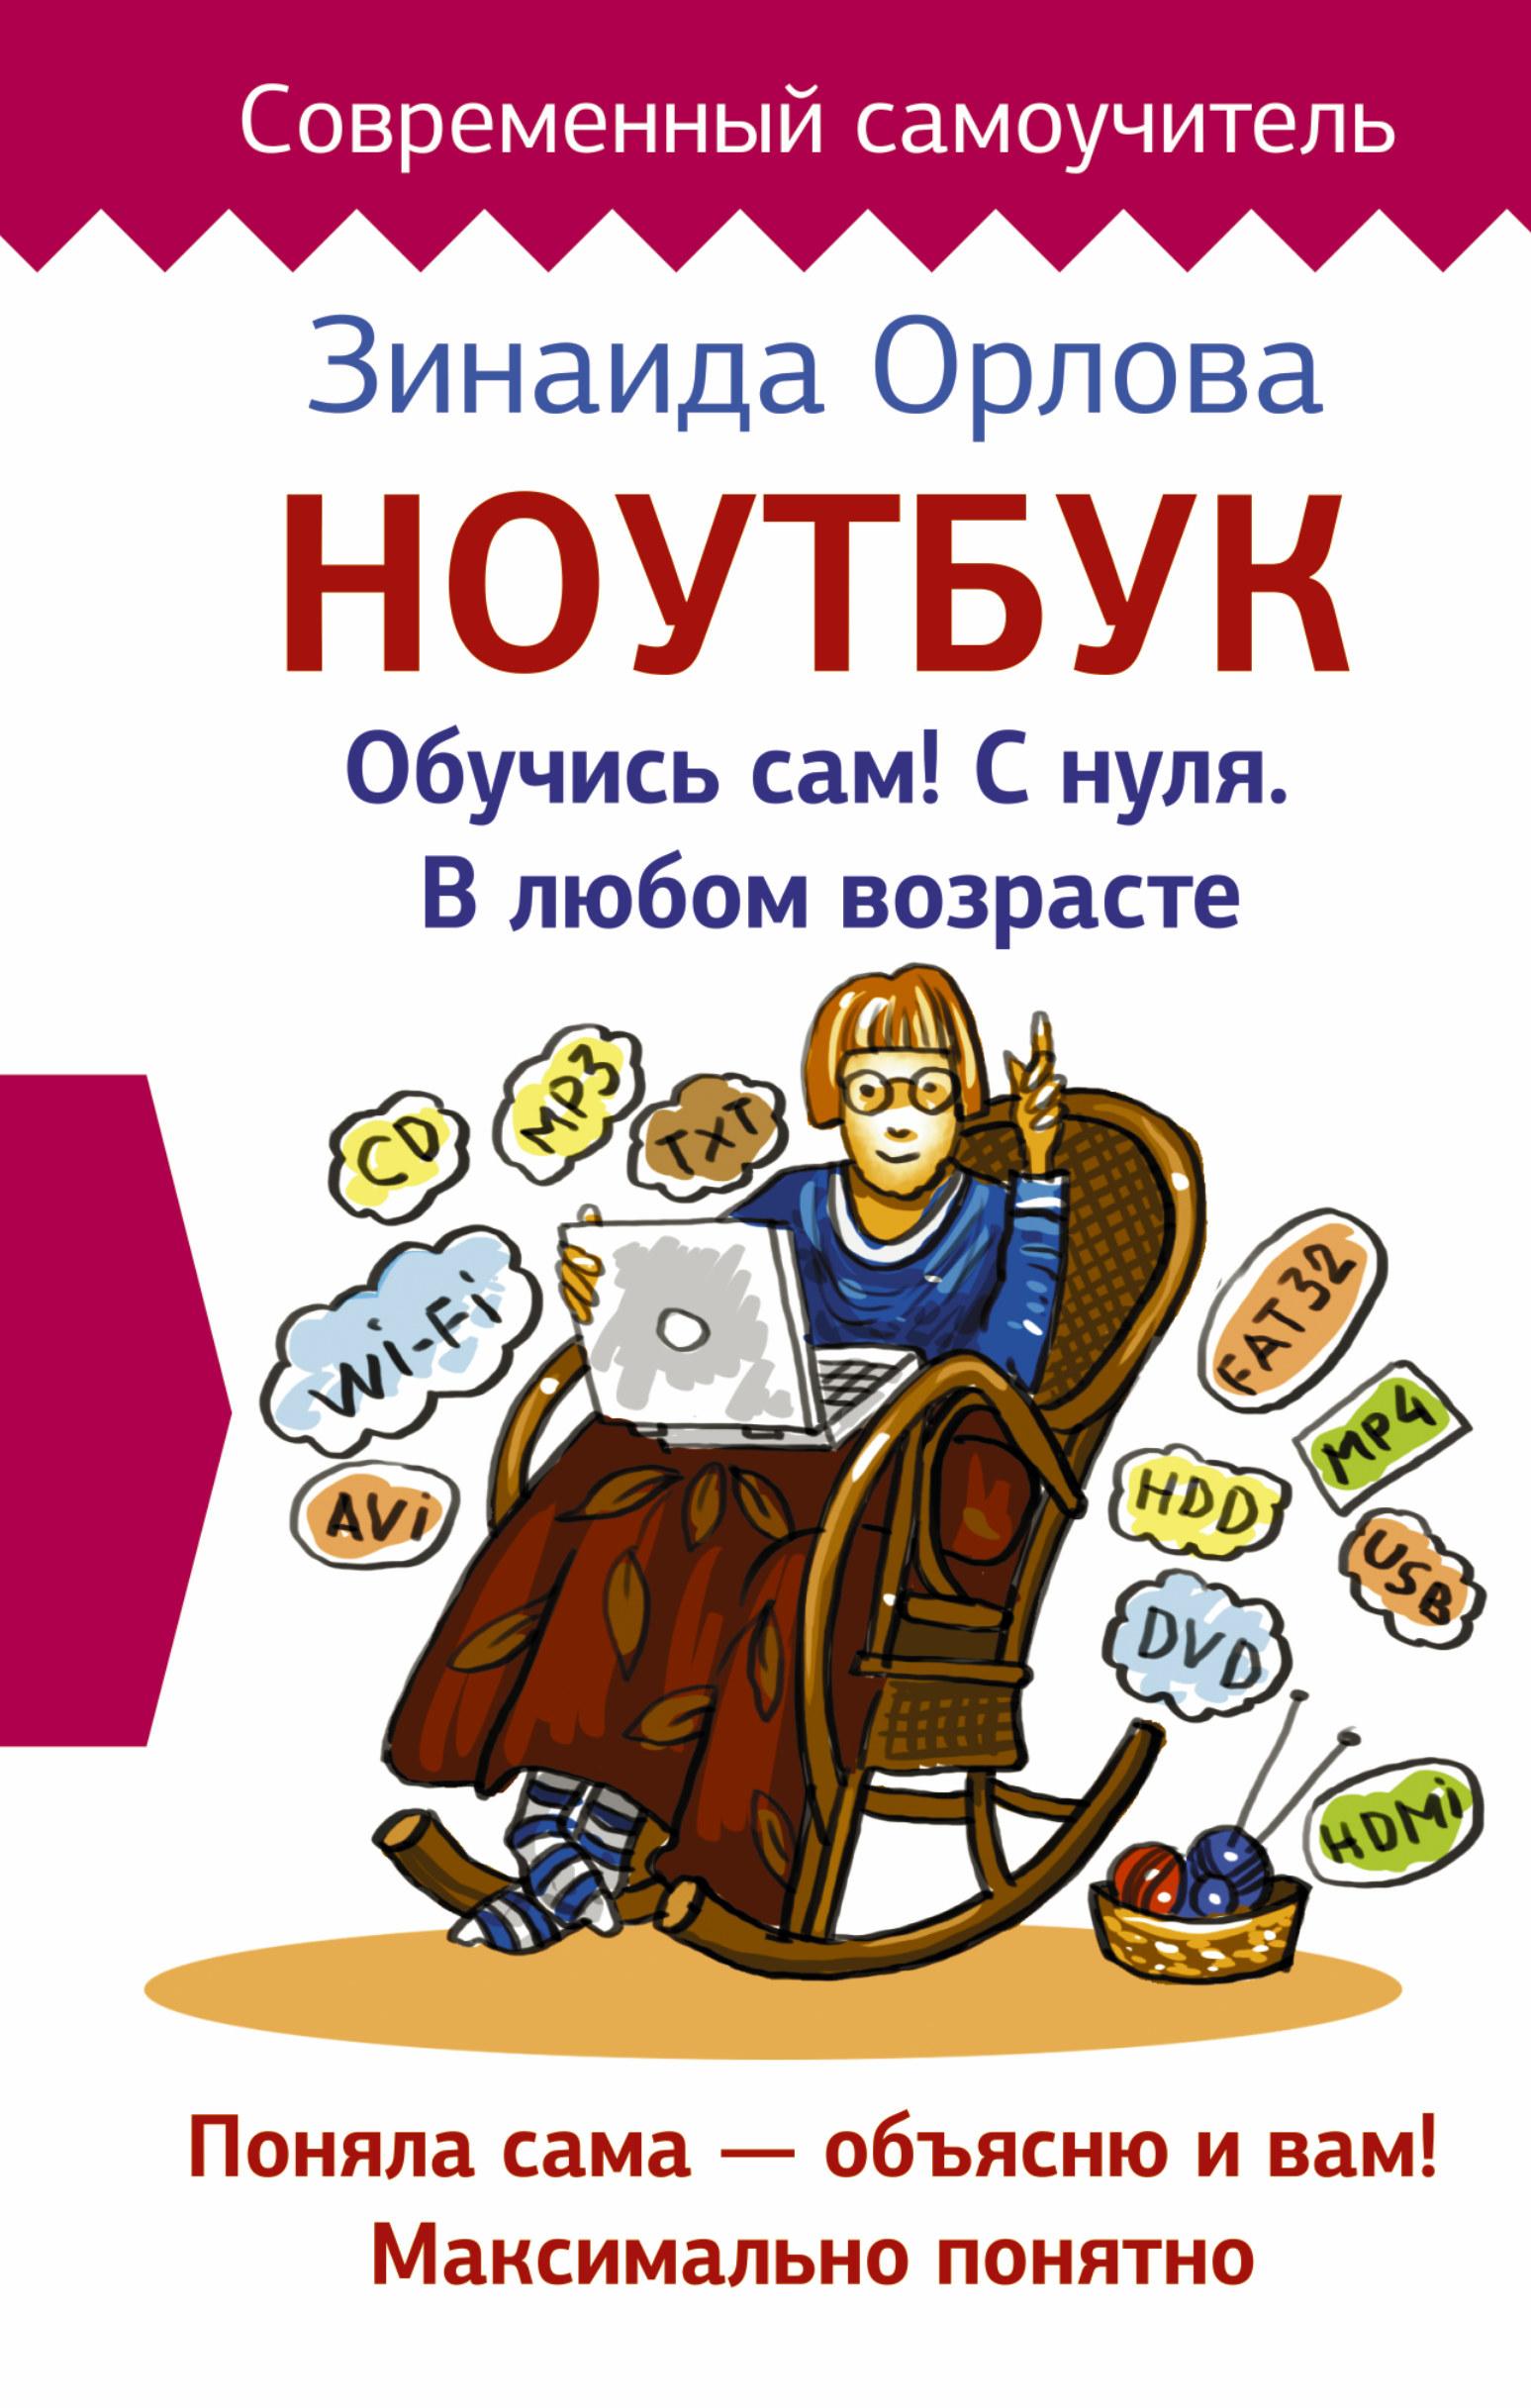 Ноутбук. Обучись сам! С нуля. В любом возрасте от book24.ru